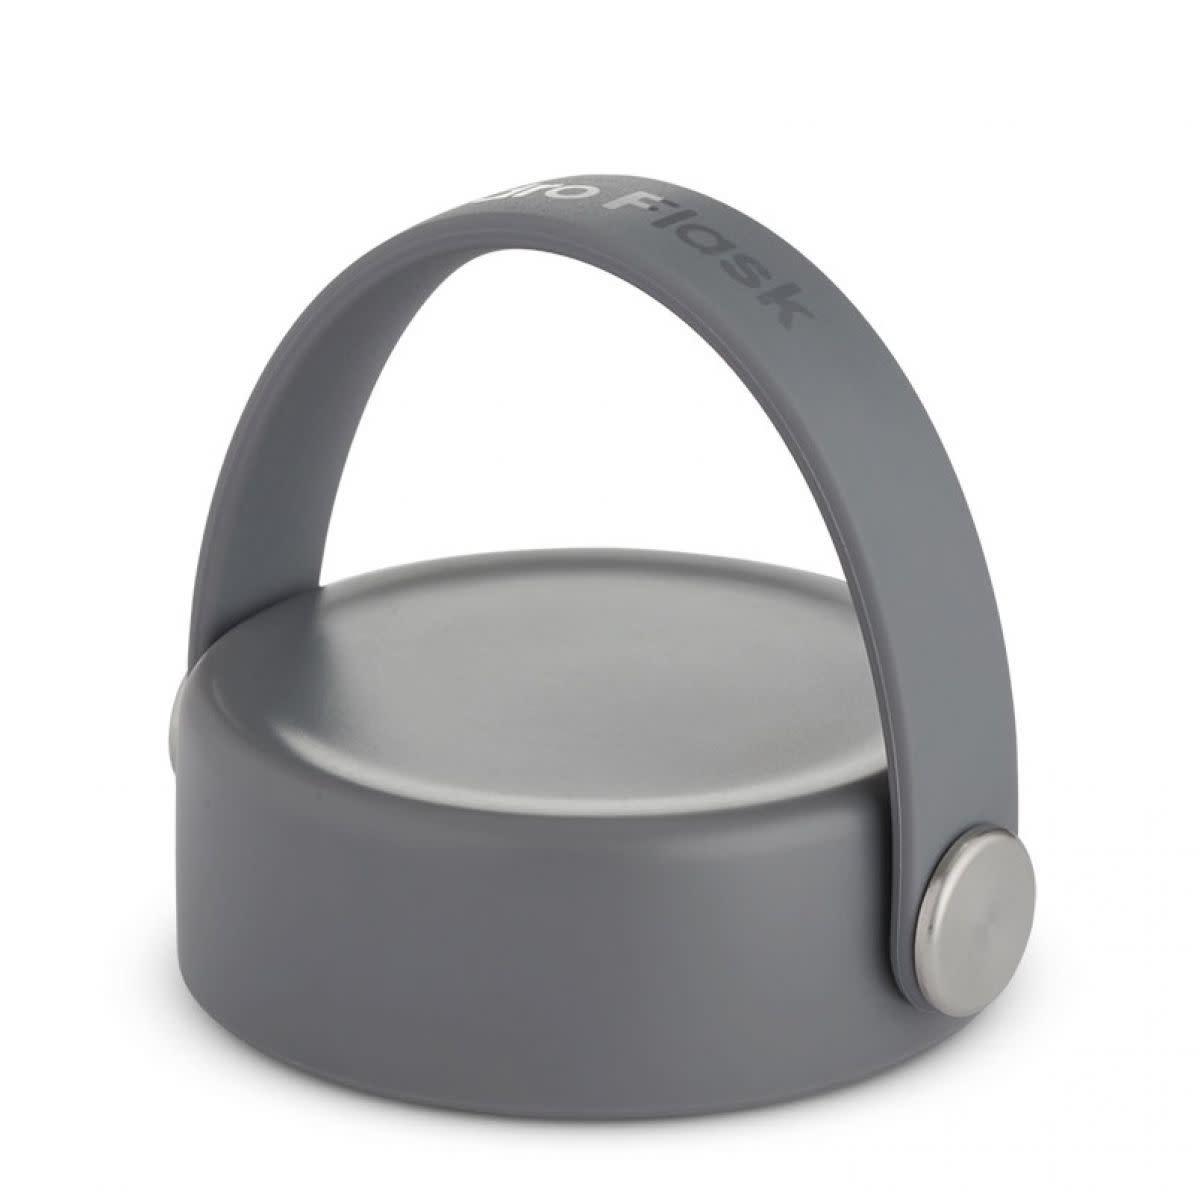 Hydroflask HF WIDE MOUTH FLEX CAP